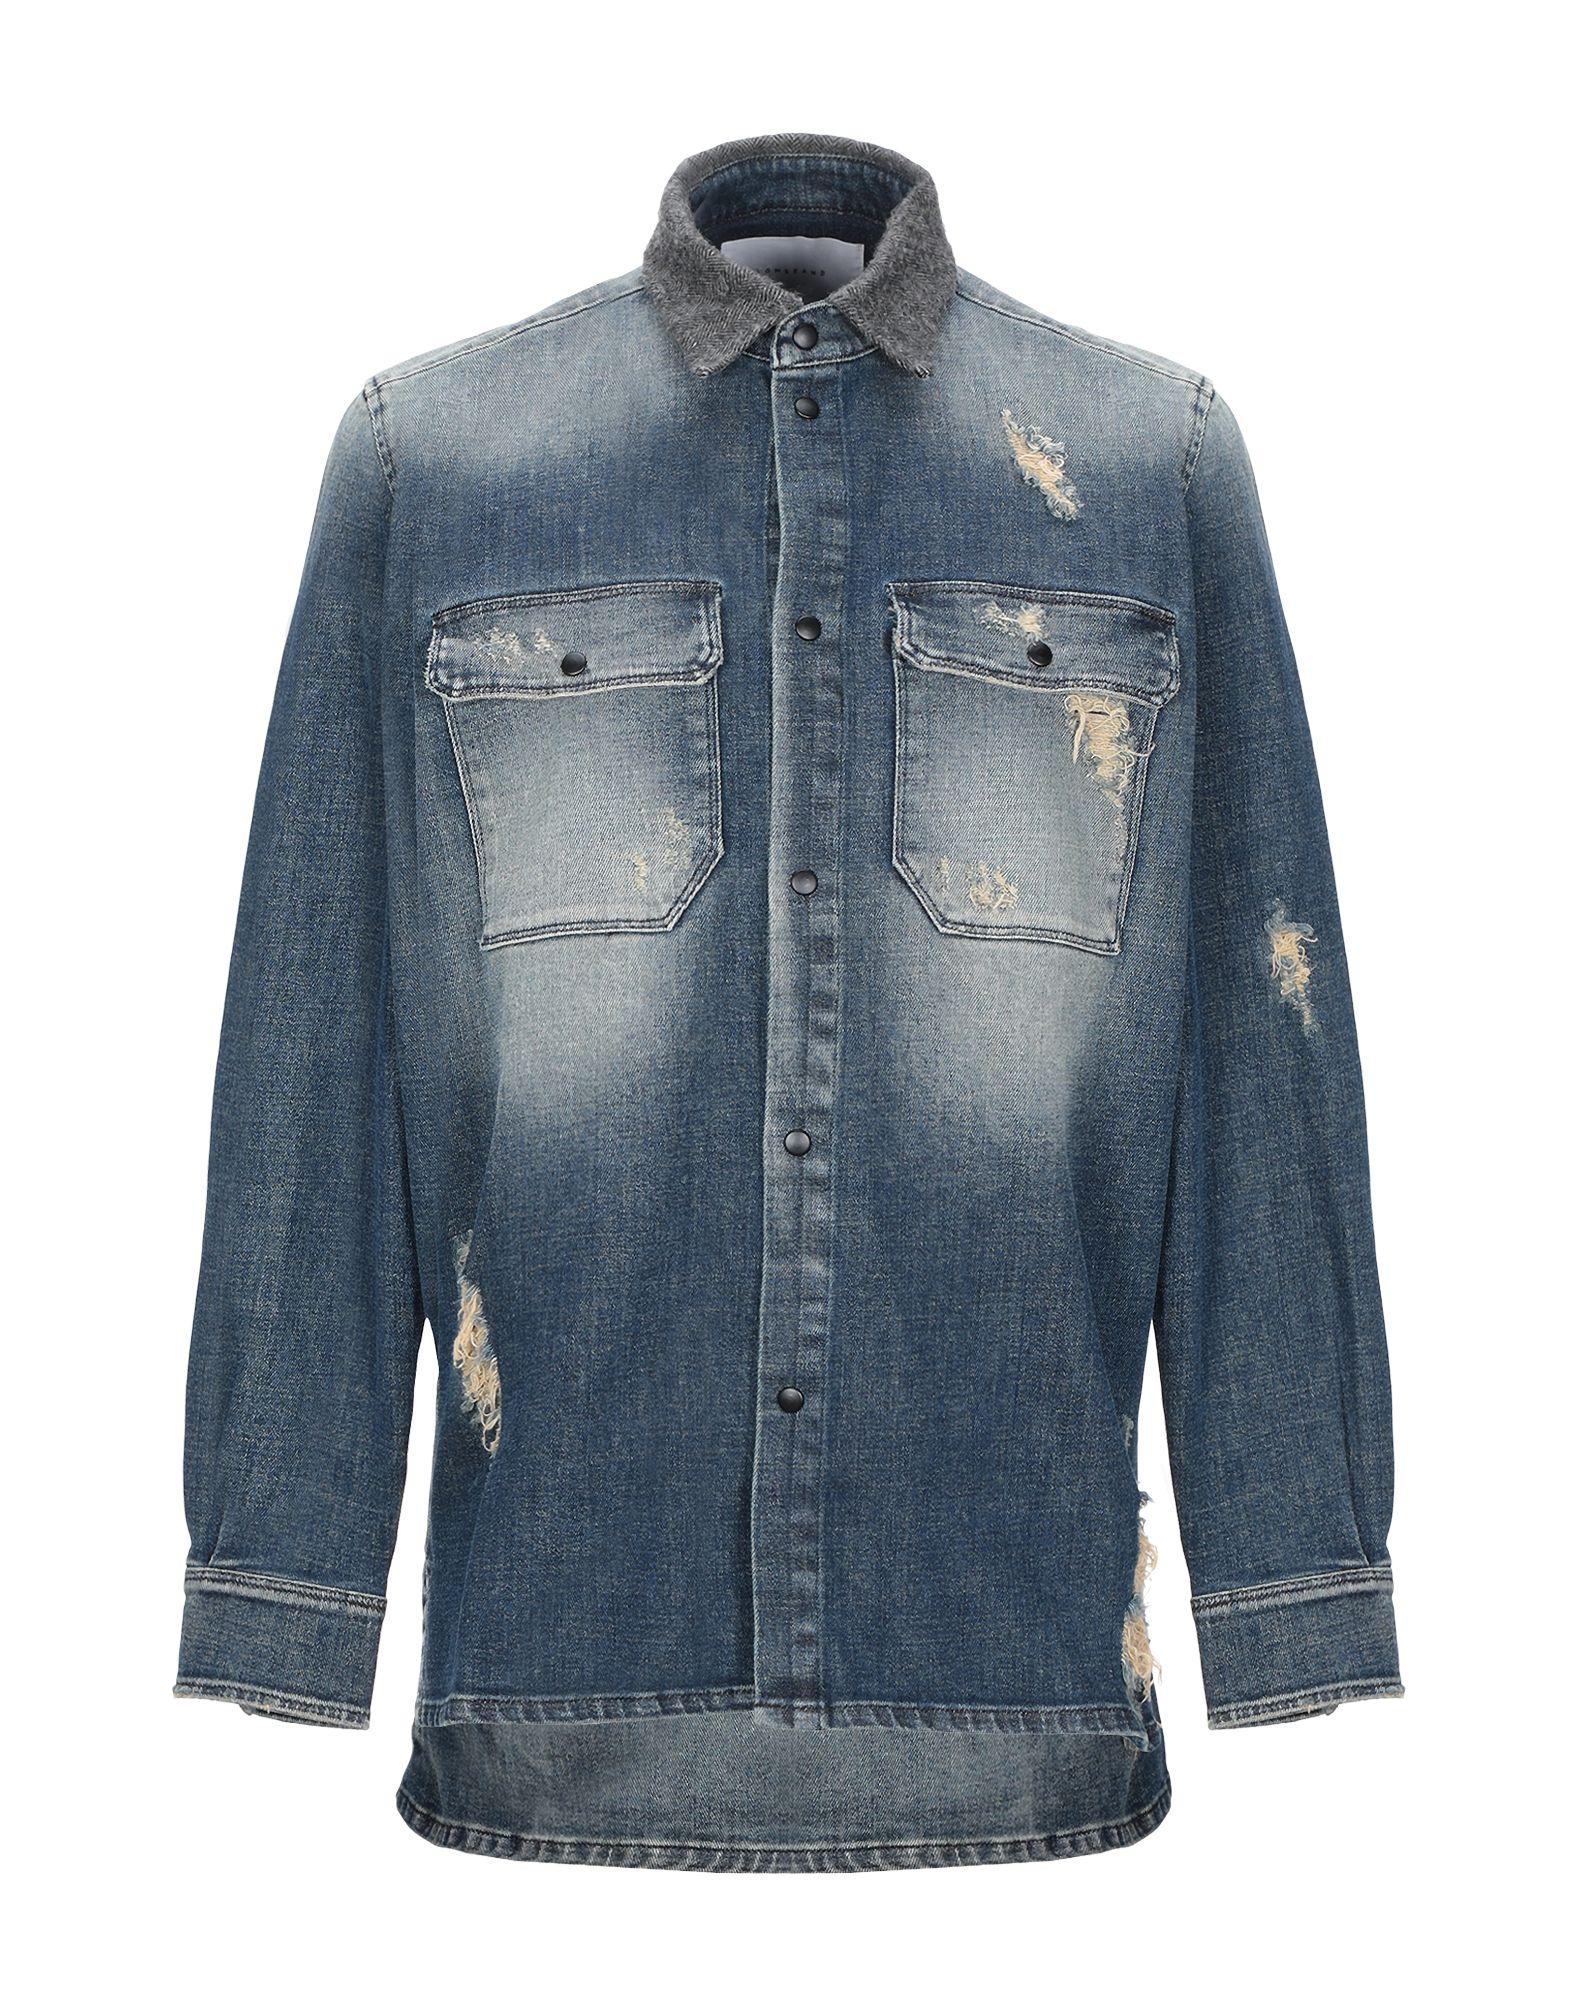 LOW BRAND Джинсовая рубашка low brand джинсовая рубашка